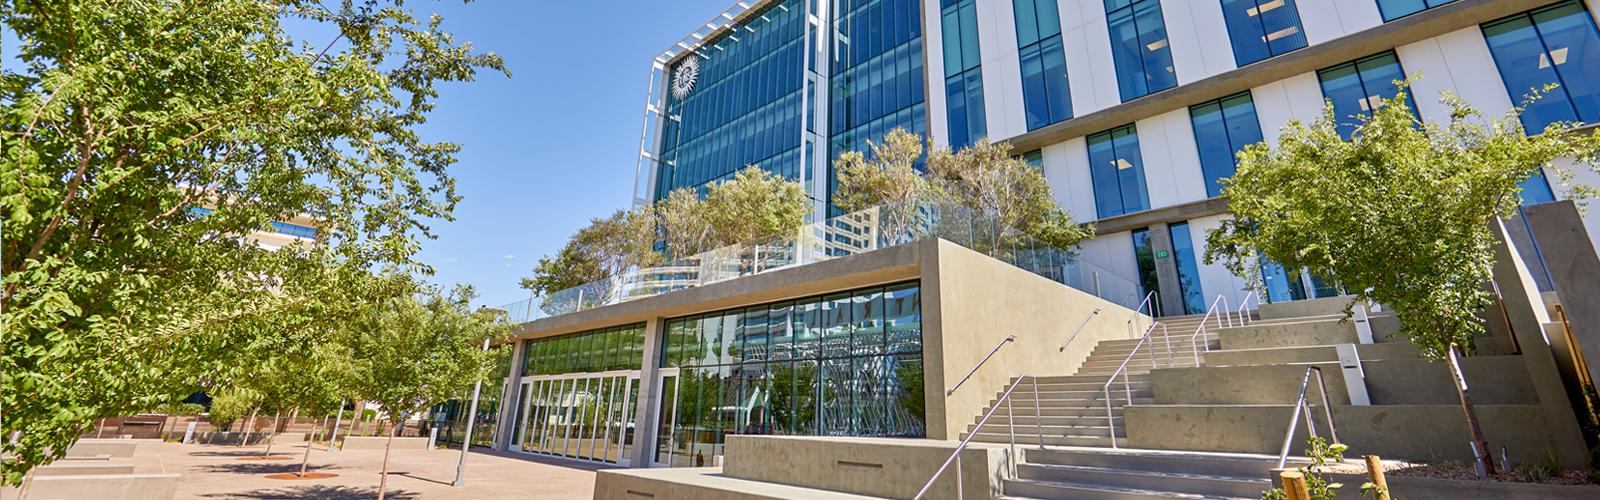 Phoenix-Health-Sciences-Campus-back